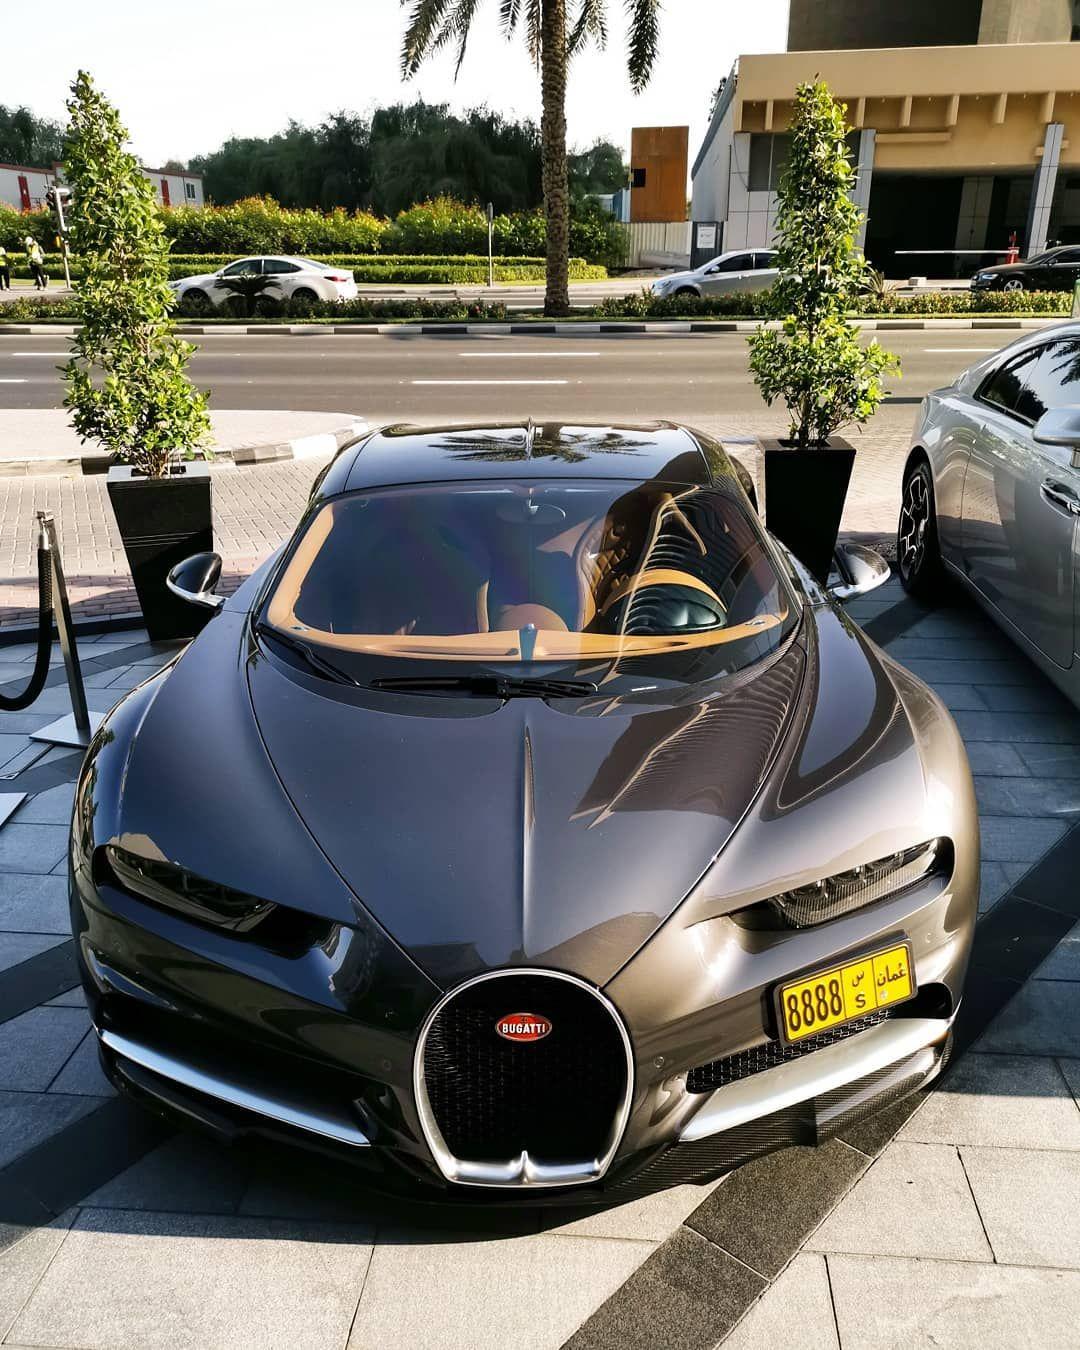 Chiron Bugatti Cars Luxury Cars Luxury Car Brands